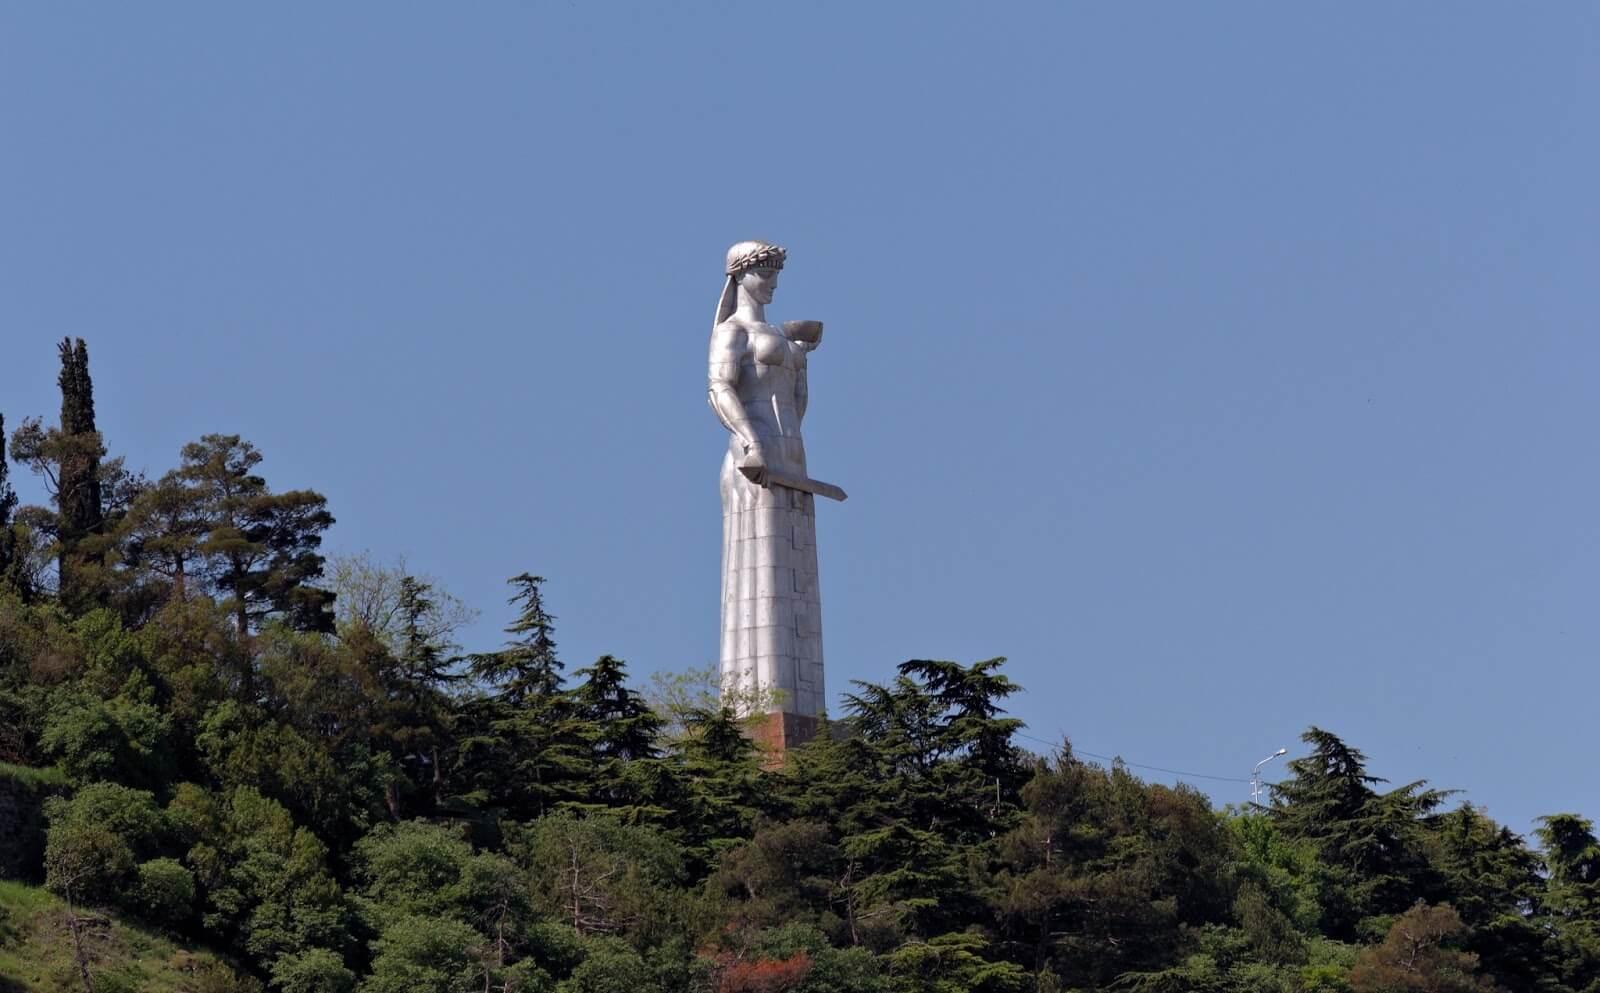 Kartlis Deda Statue in Georgia